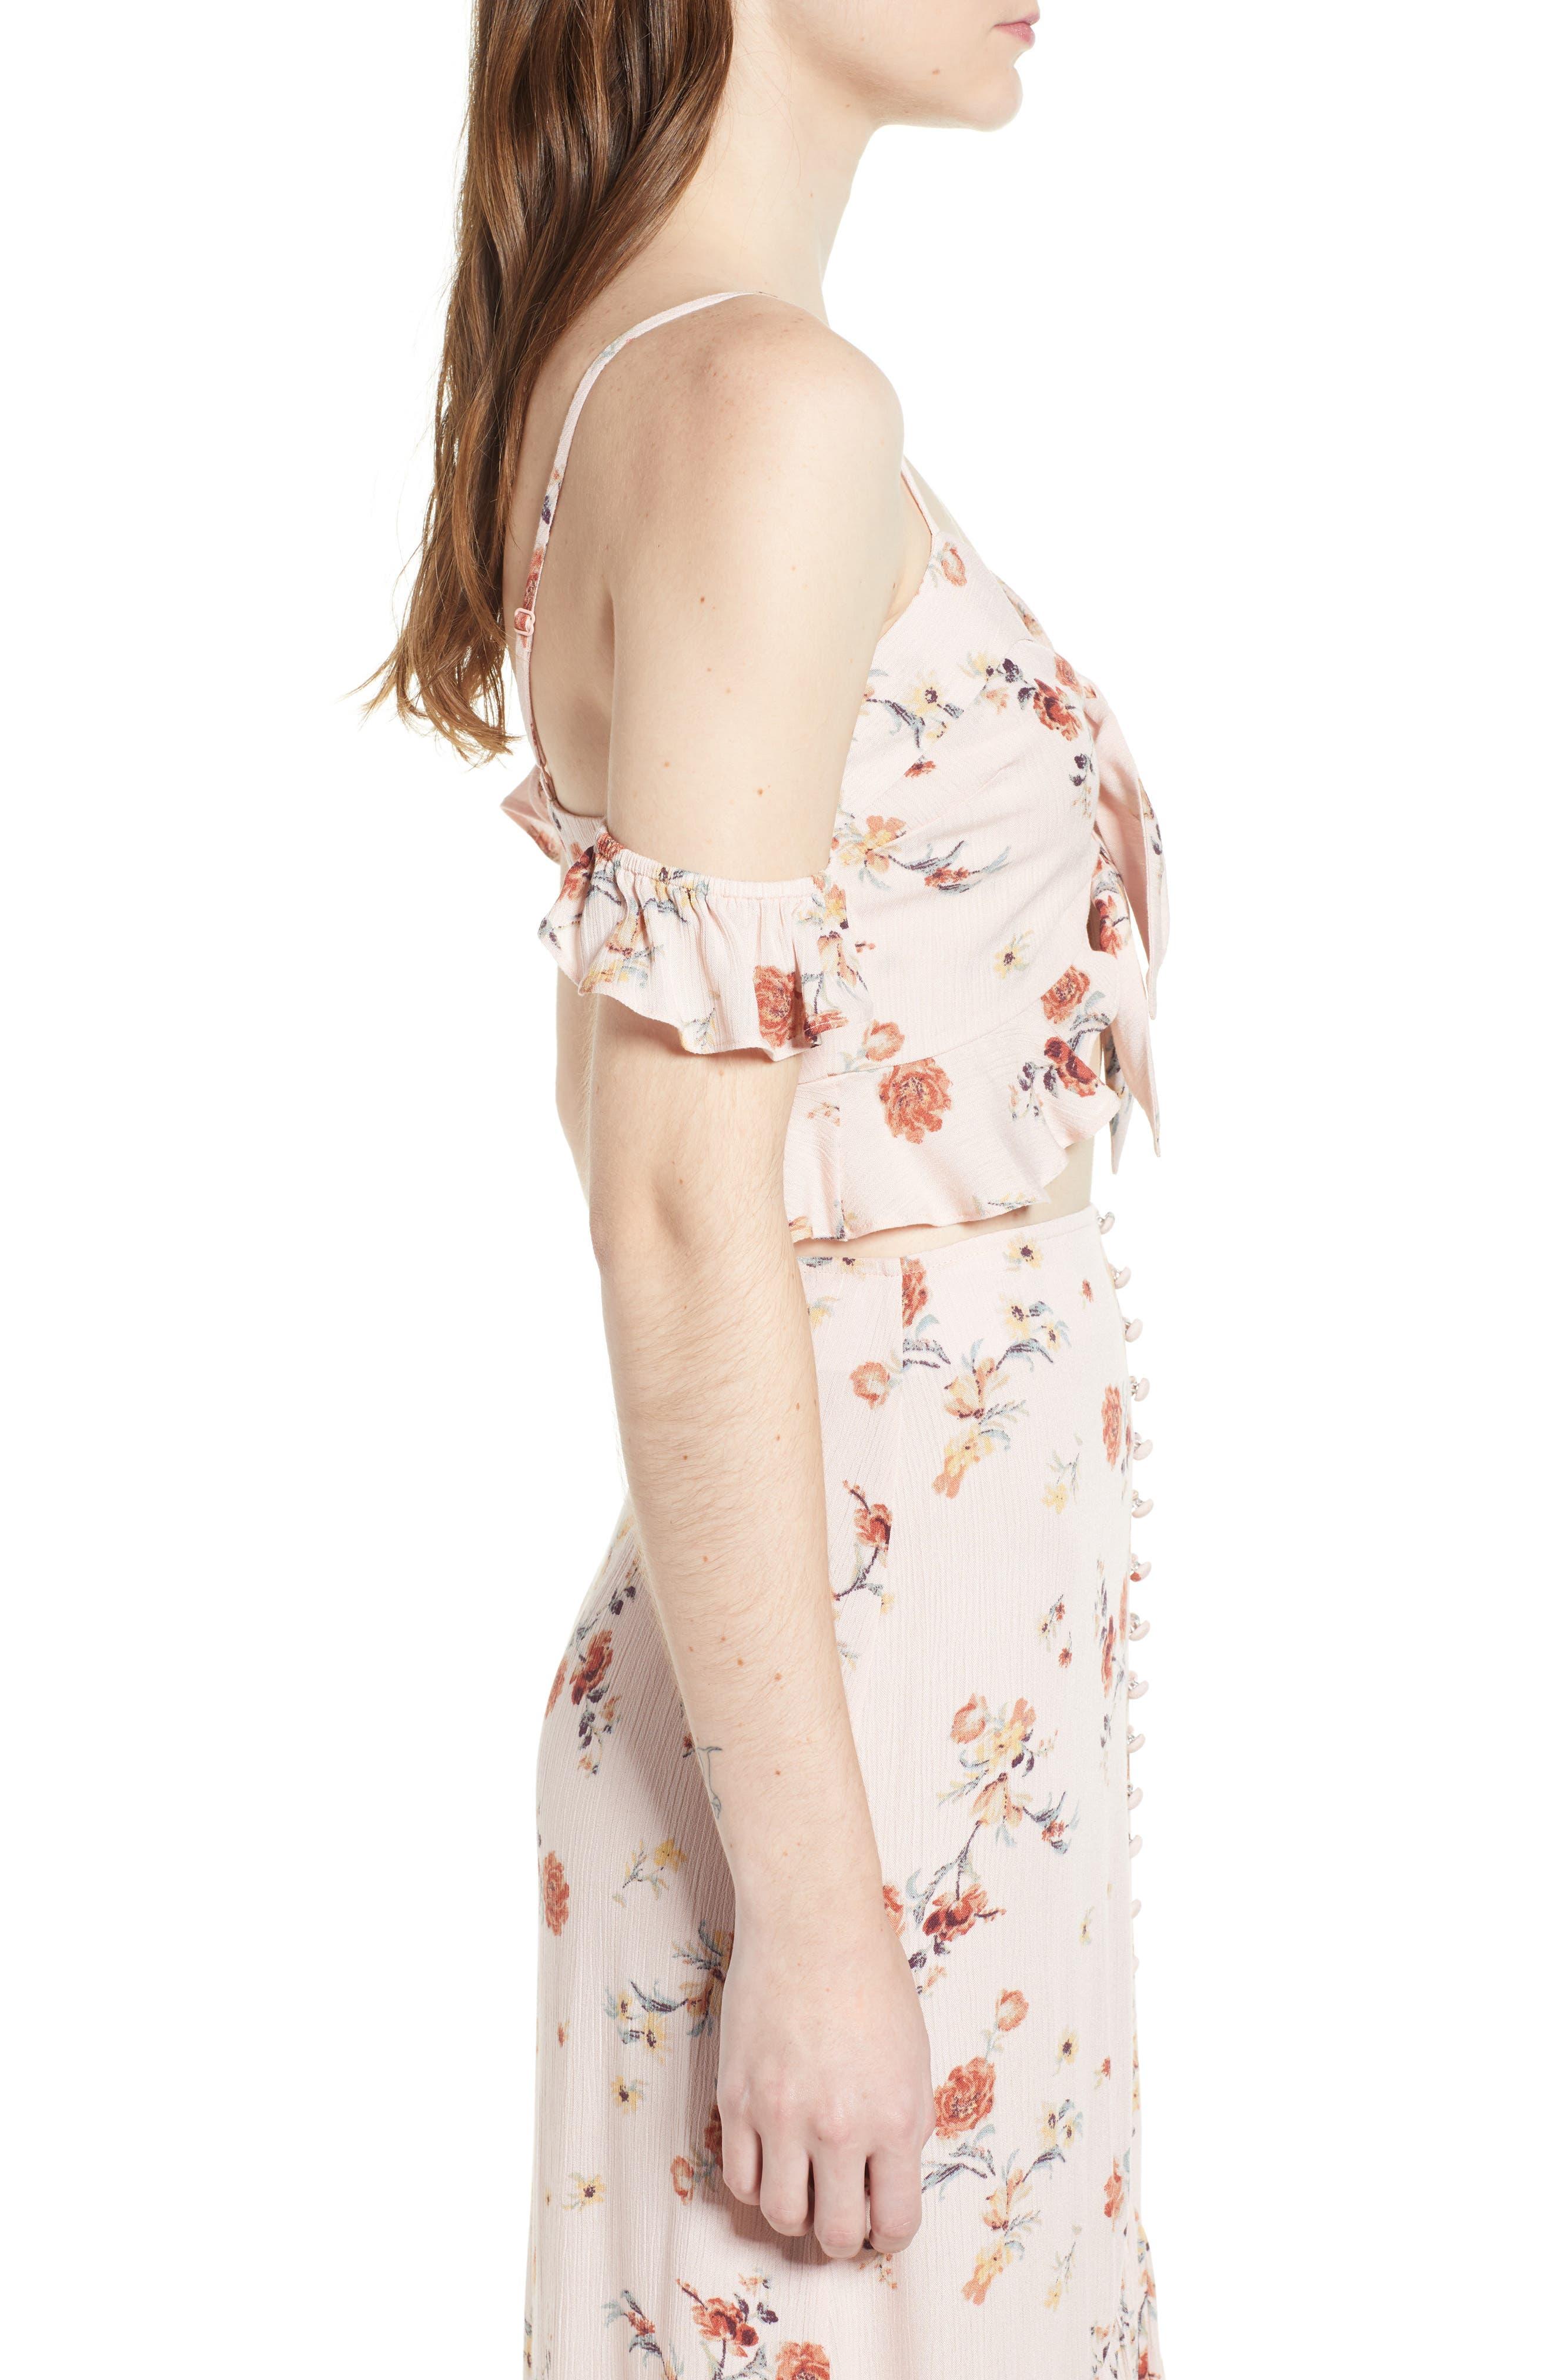 Rosa Floral Tie Front Crop Top,                             Alternate thumbnail 6, color,                             Pink Floral